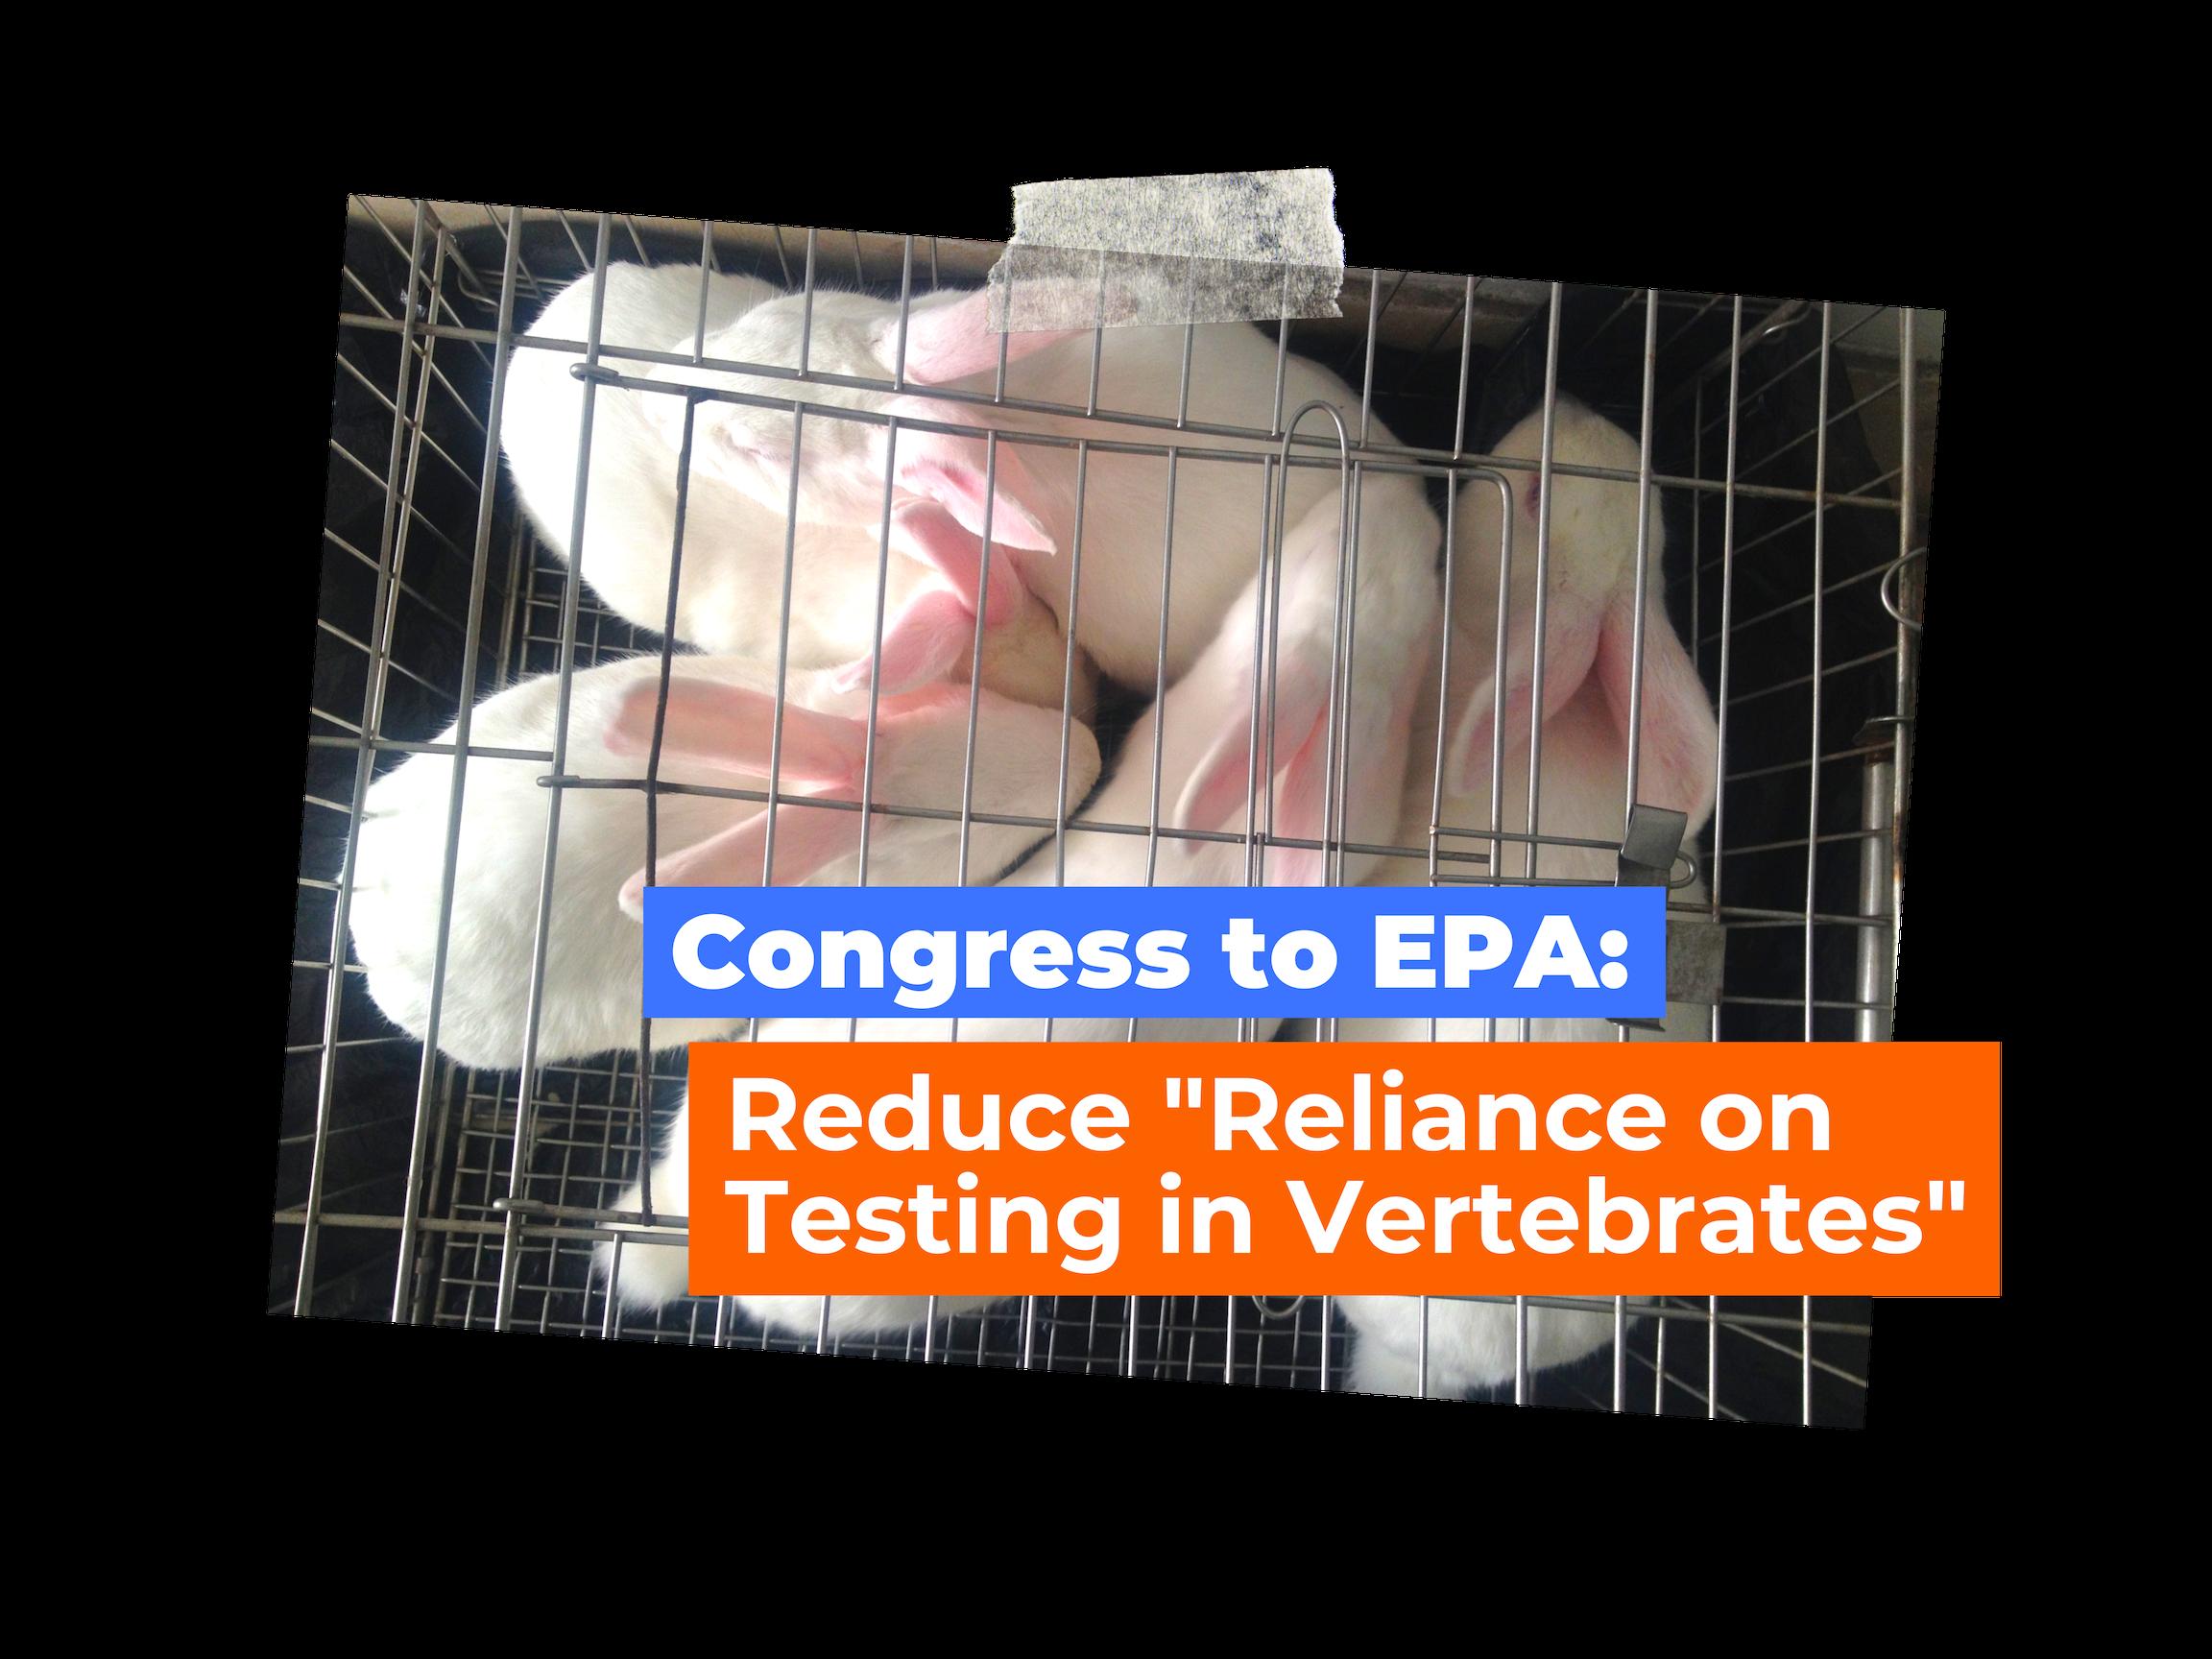 Blog.Congress Tells EPA to Reduce Testing on Vertebrates.png